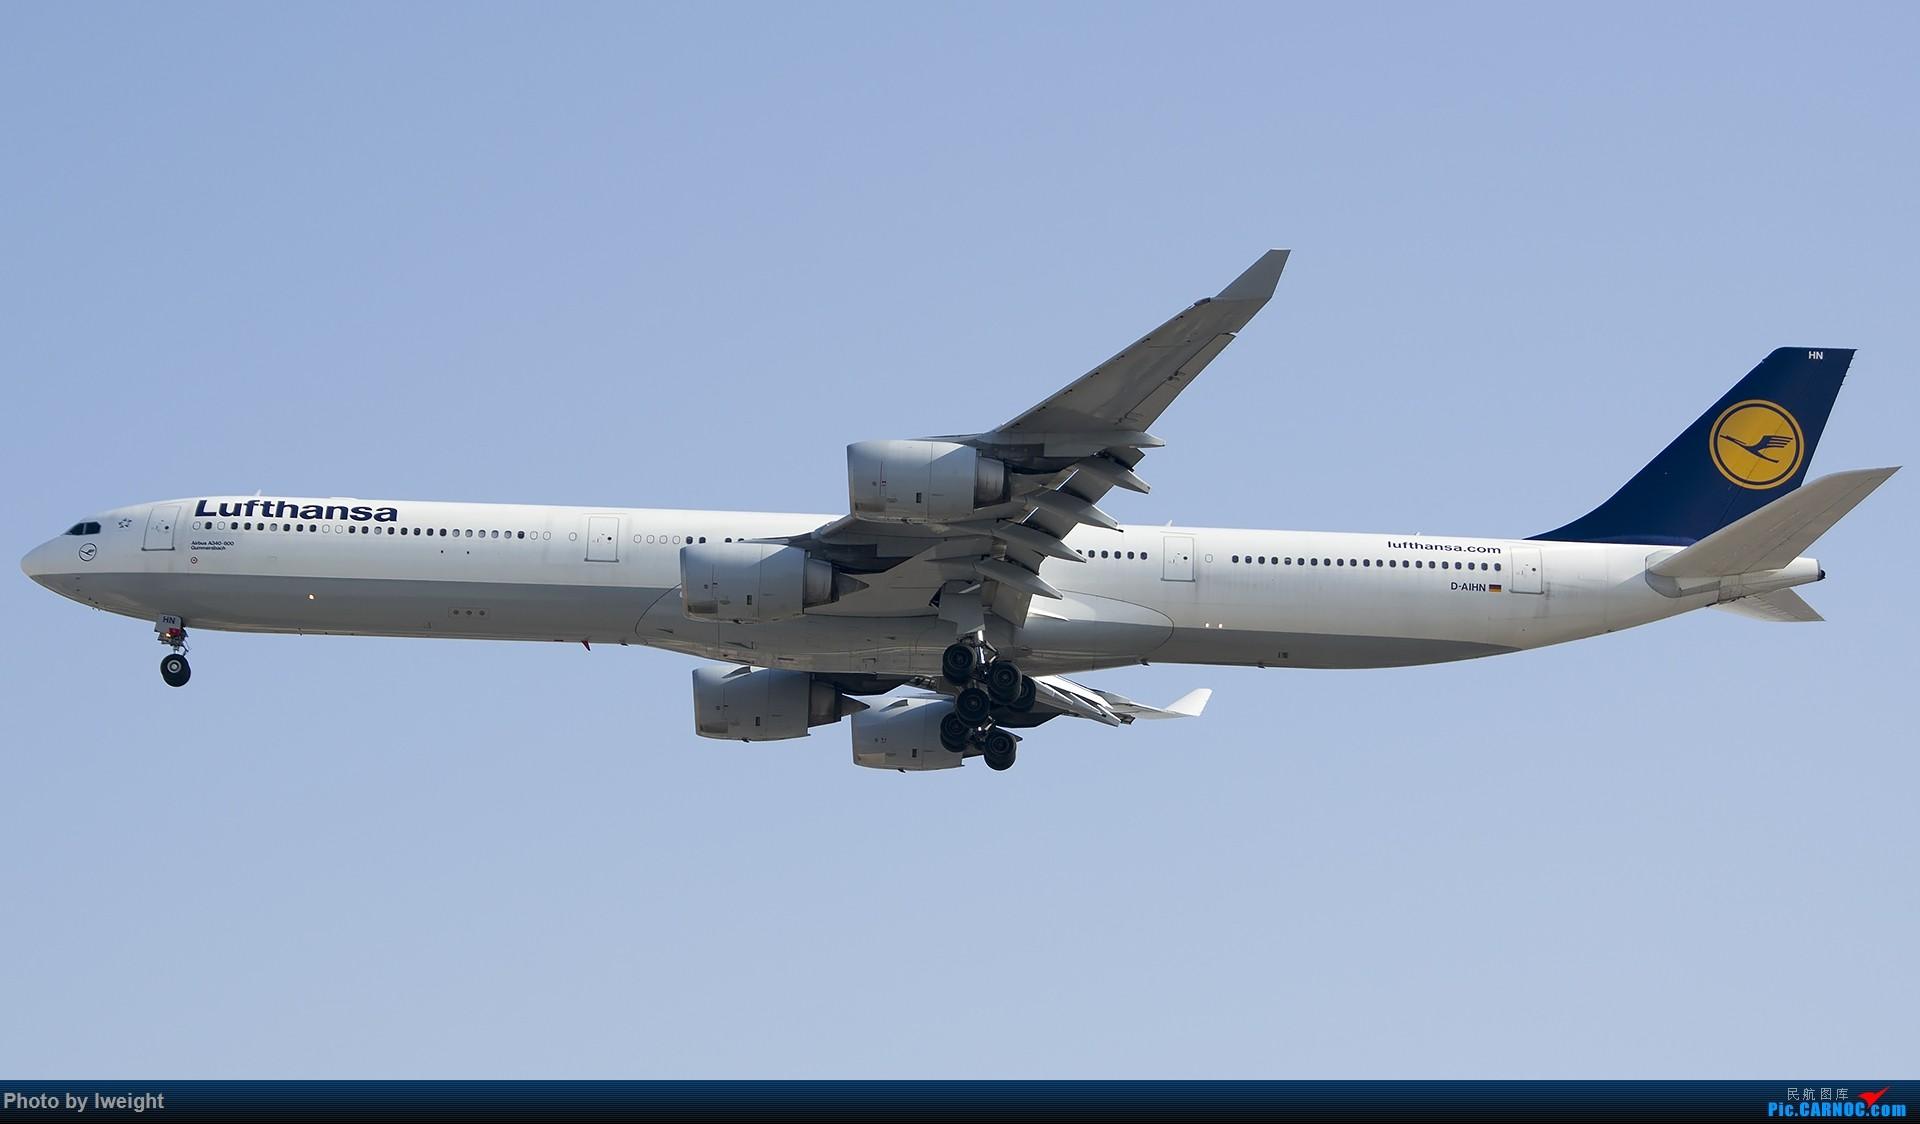 Re:[原创]2014-12-02 ZBAA随拍 AIRBUS A340-600 D-AIHN 中国北京首都国际机场